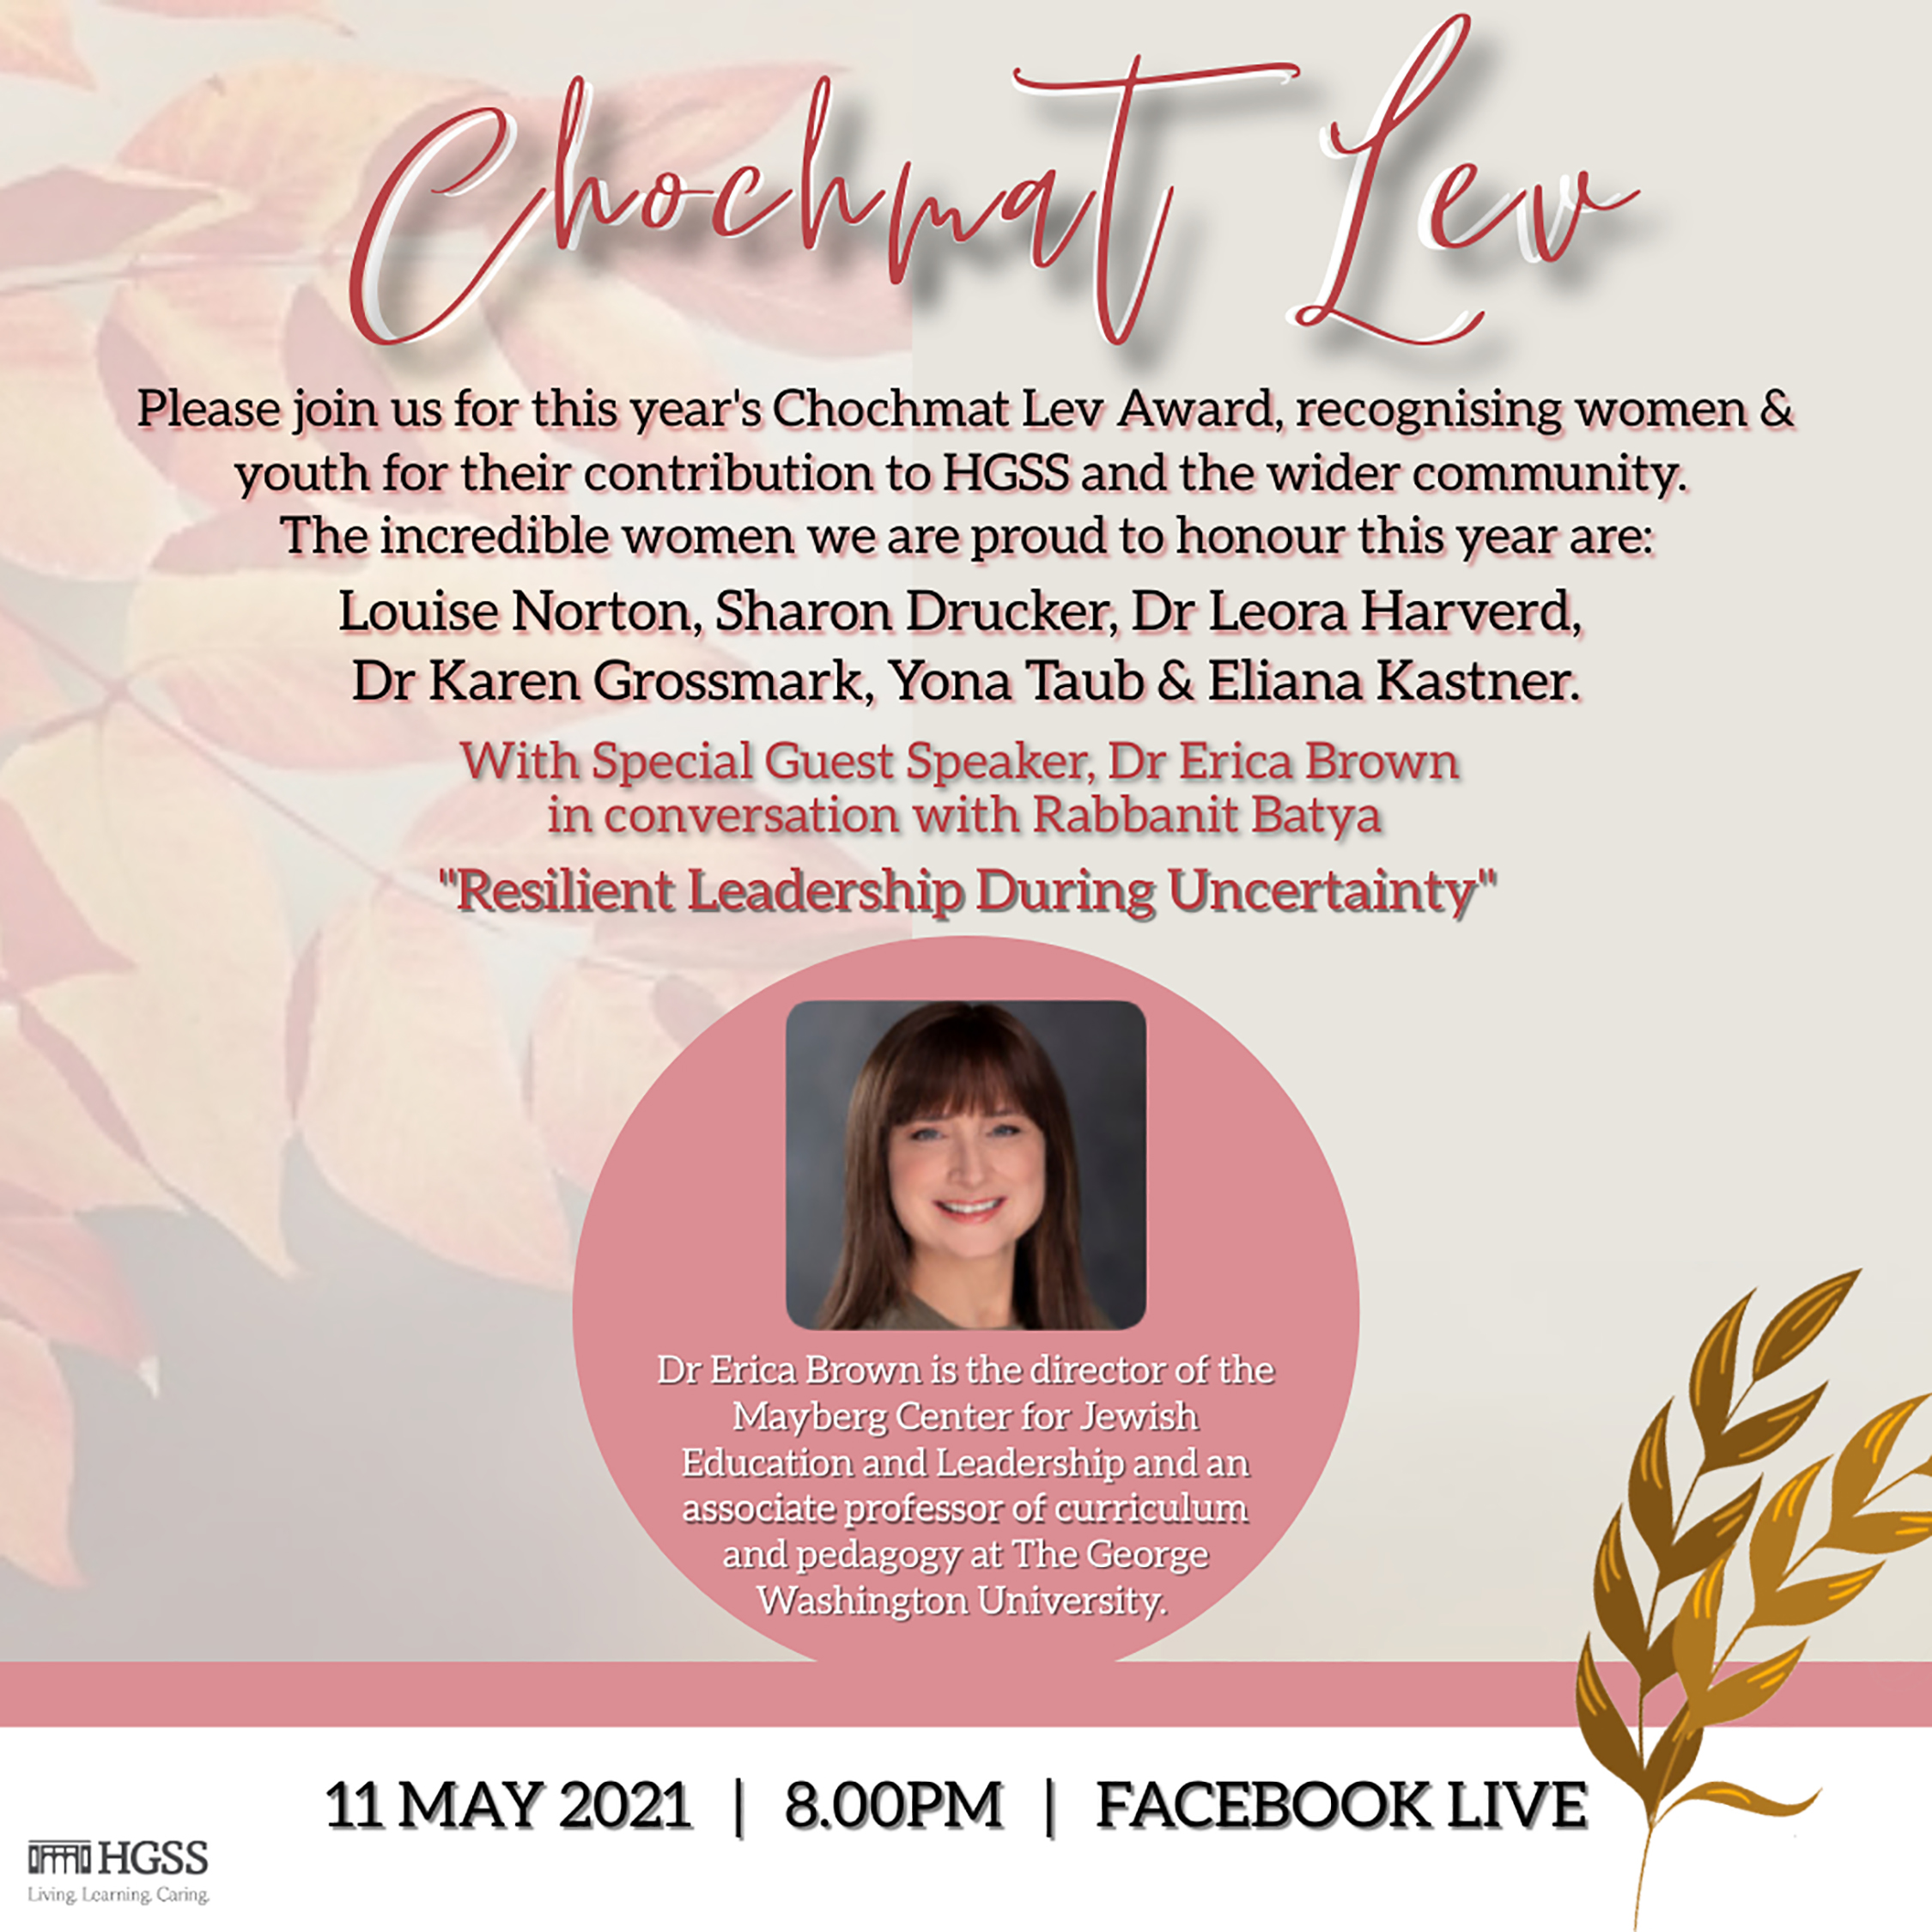 Chochmat Lev @ Facebook Live